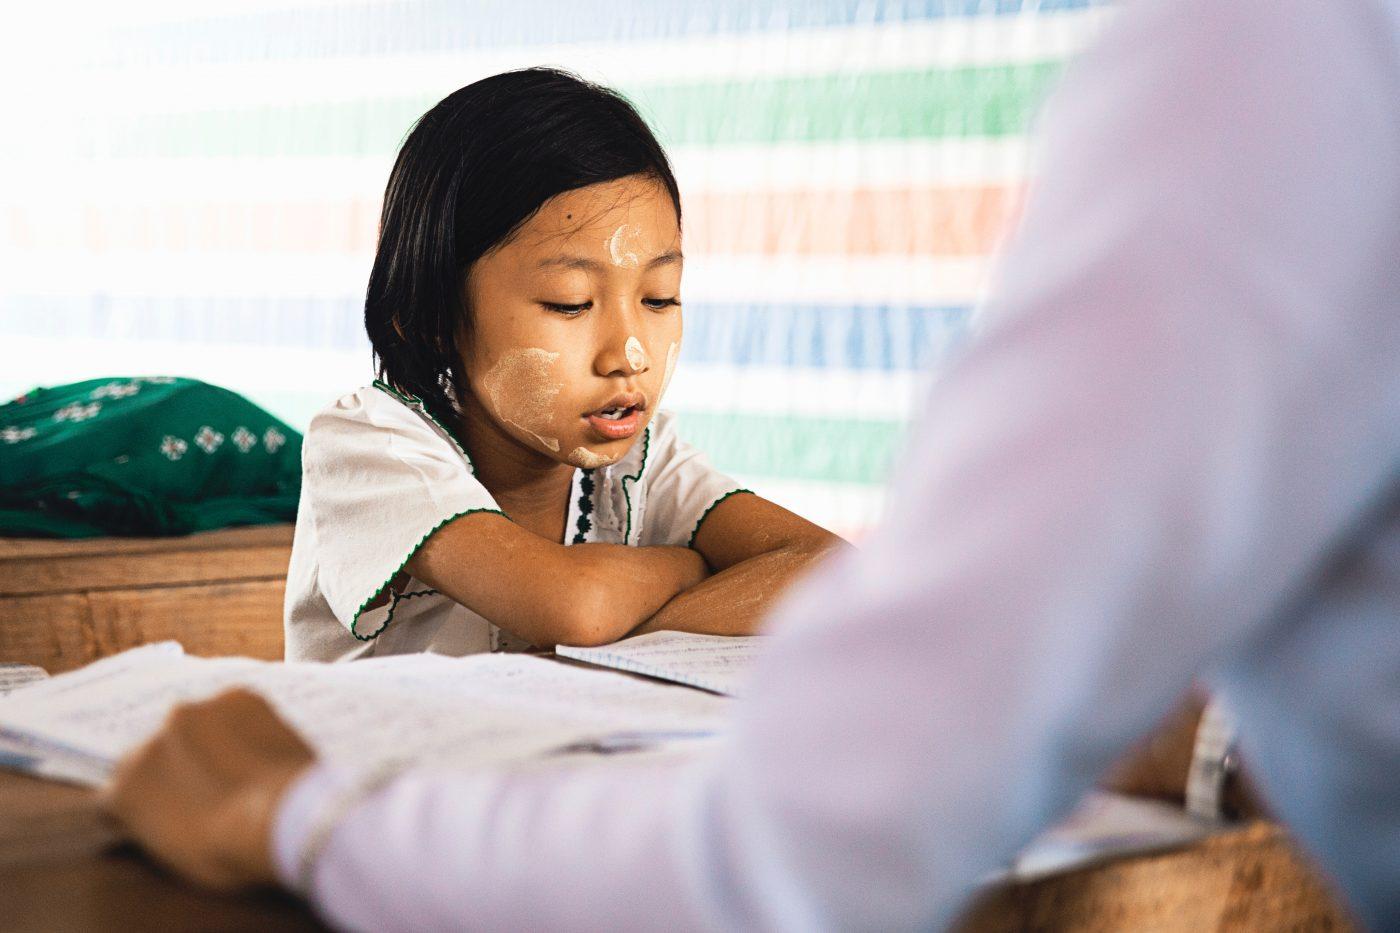 Workaway: Teaching child homework tutoring